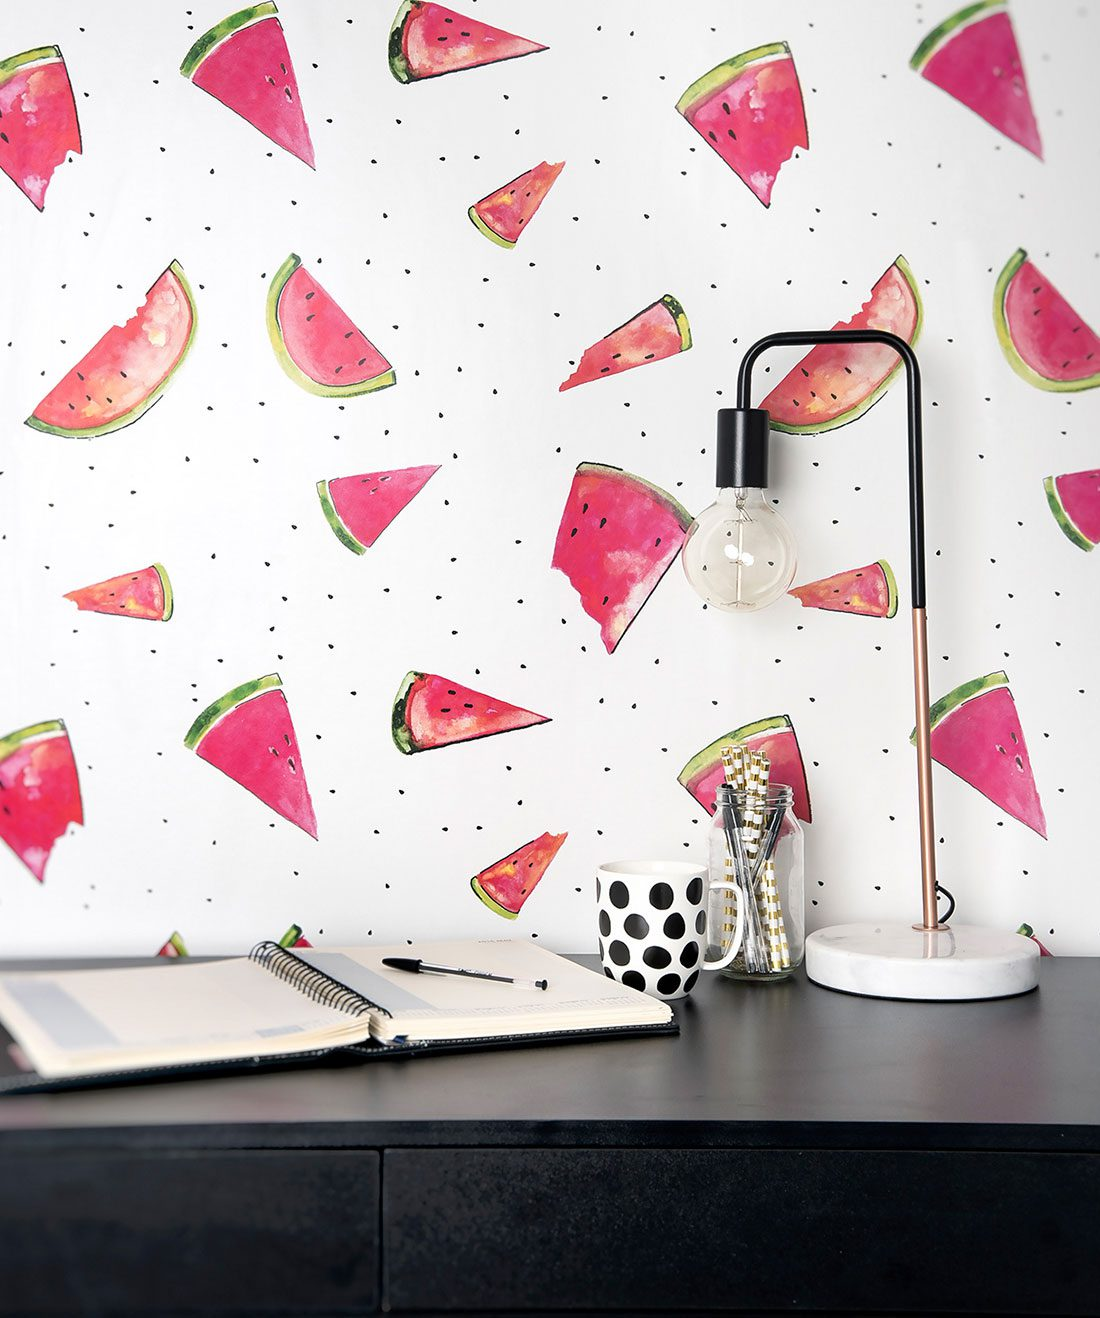 A Slice Watermelon Wallpaper